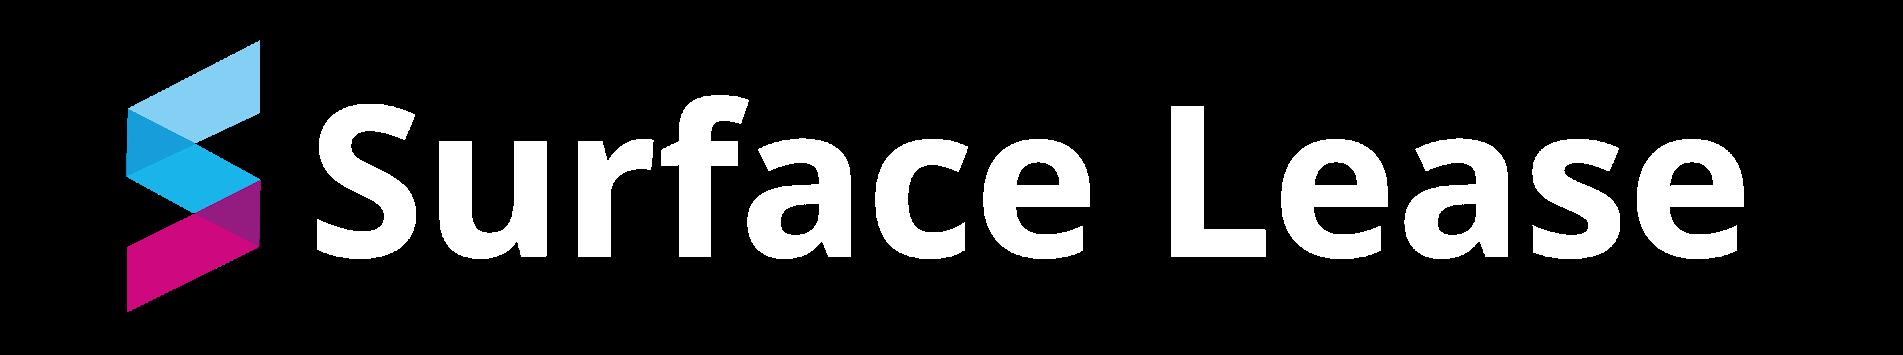 microsoft surface logo